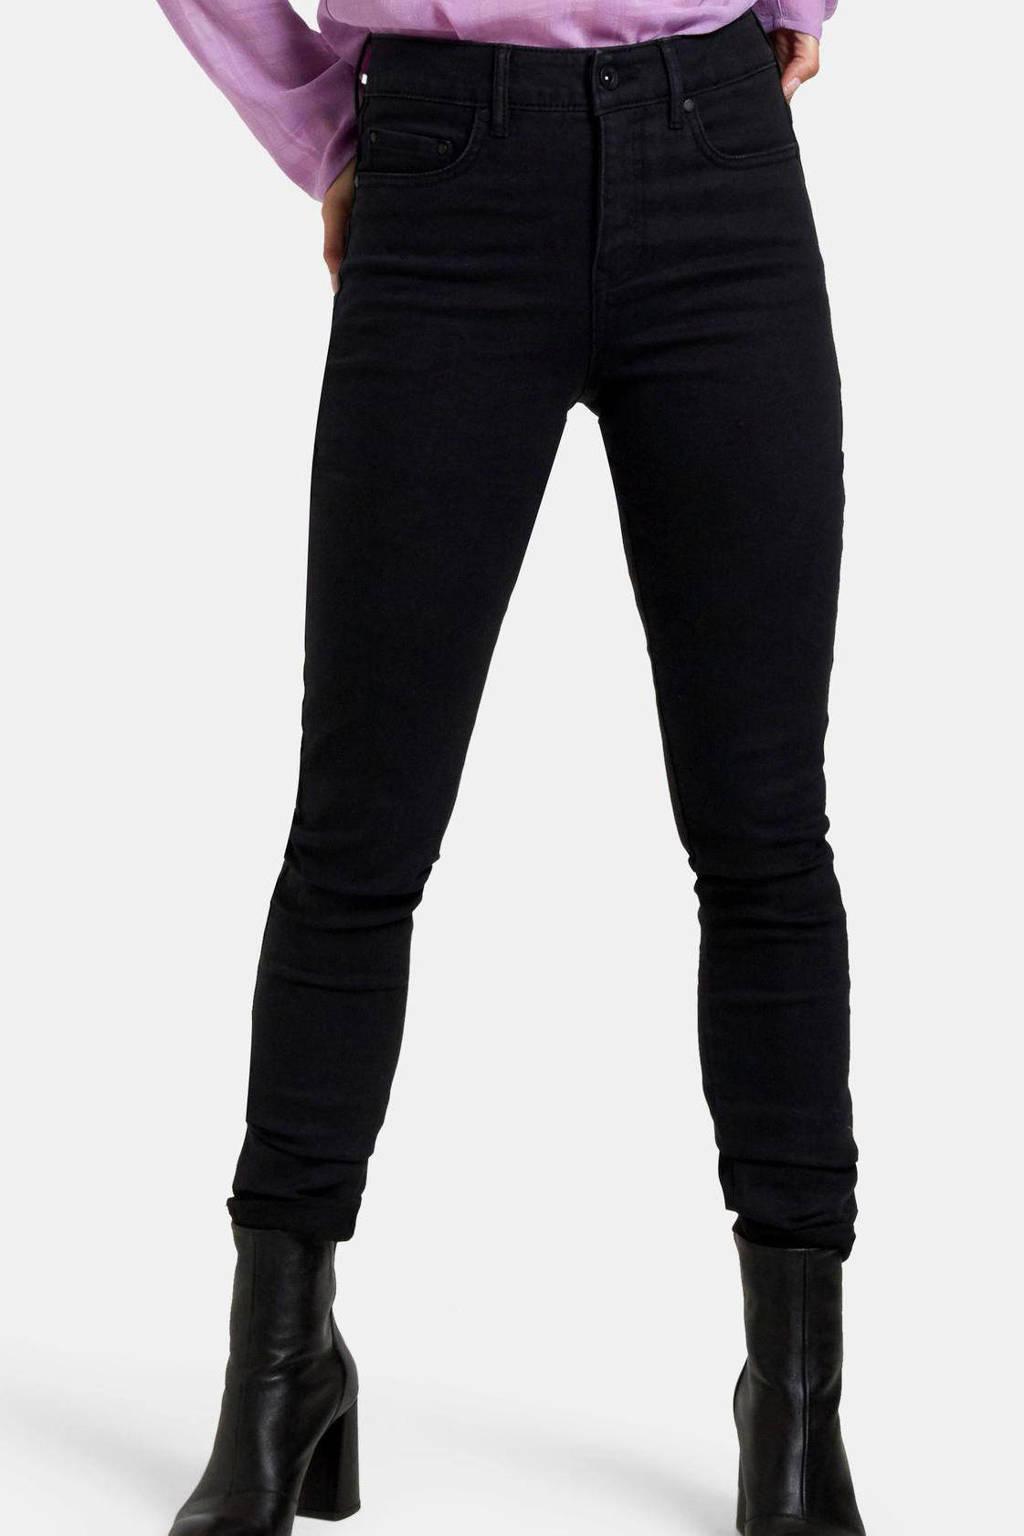 Shoeby Eksept high waist skinny fit broek Raven zwart, Zwart